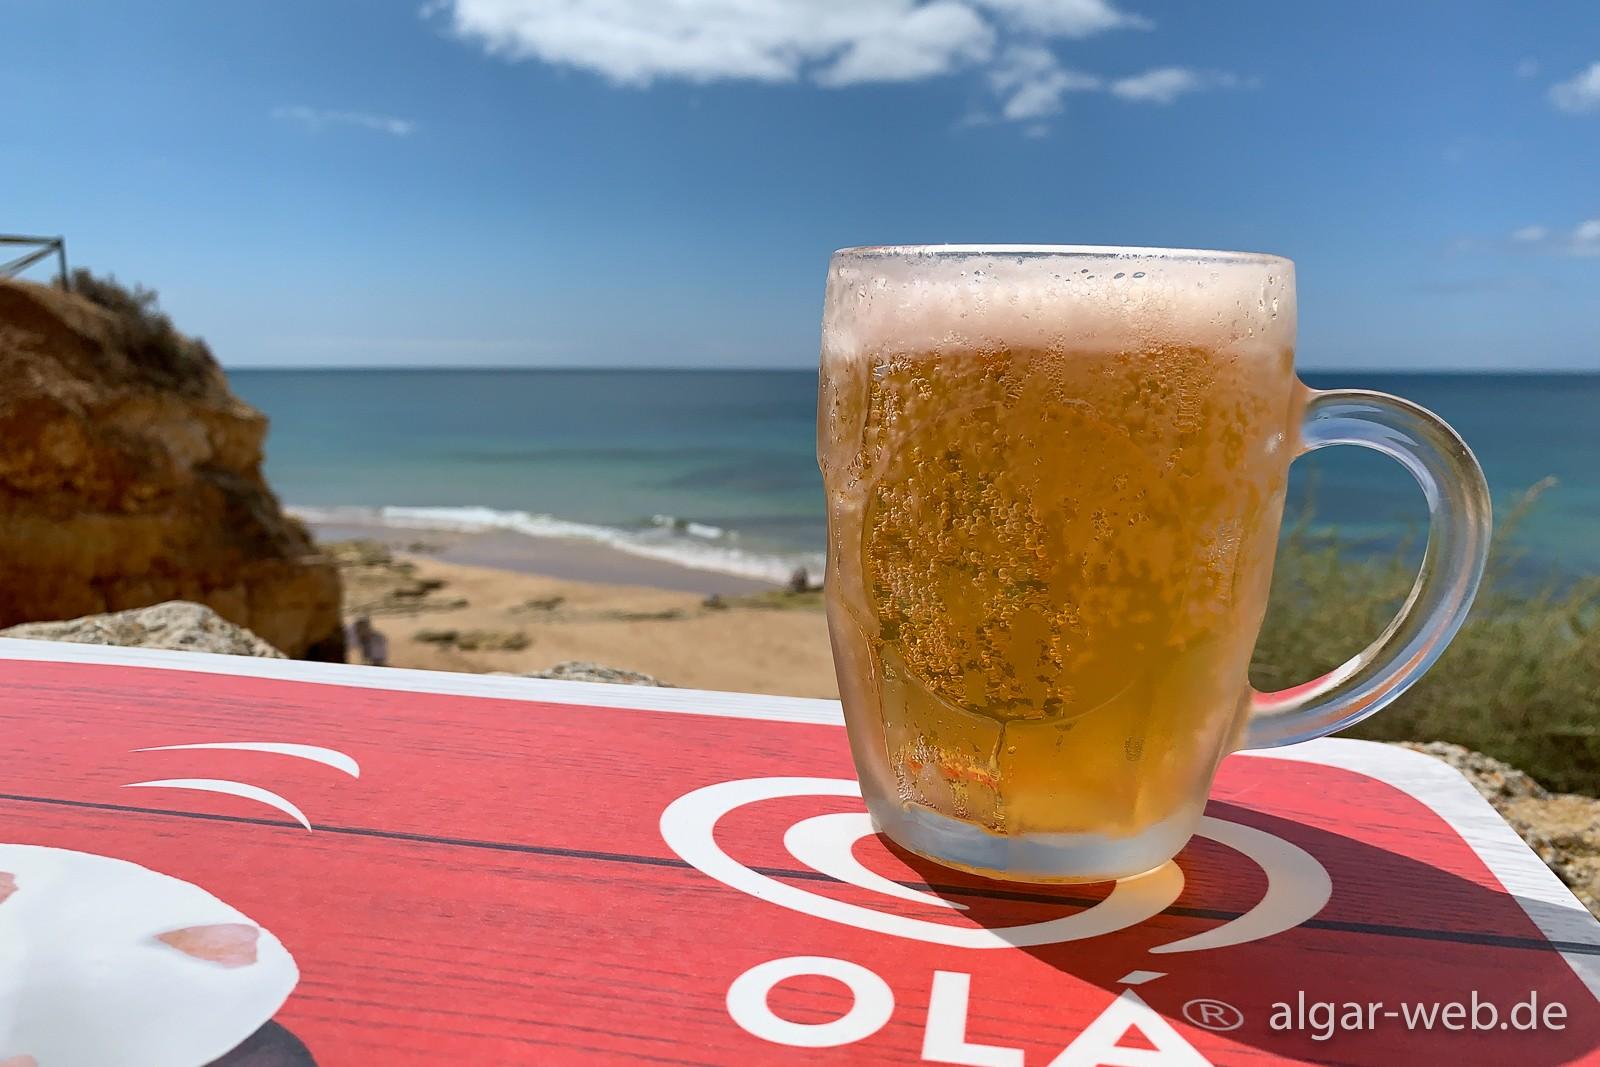 Stärkung bei fantastischem Ausblick - Pai Tomas am Praia do Vau